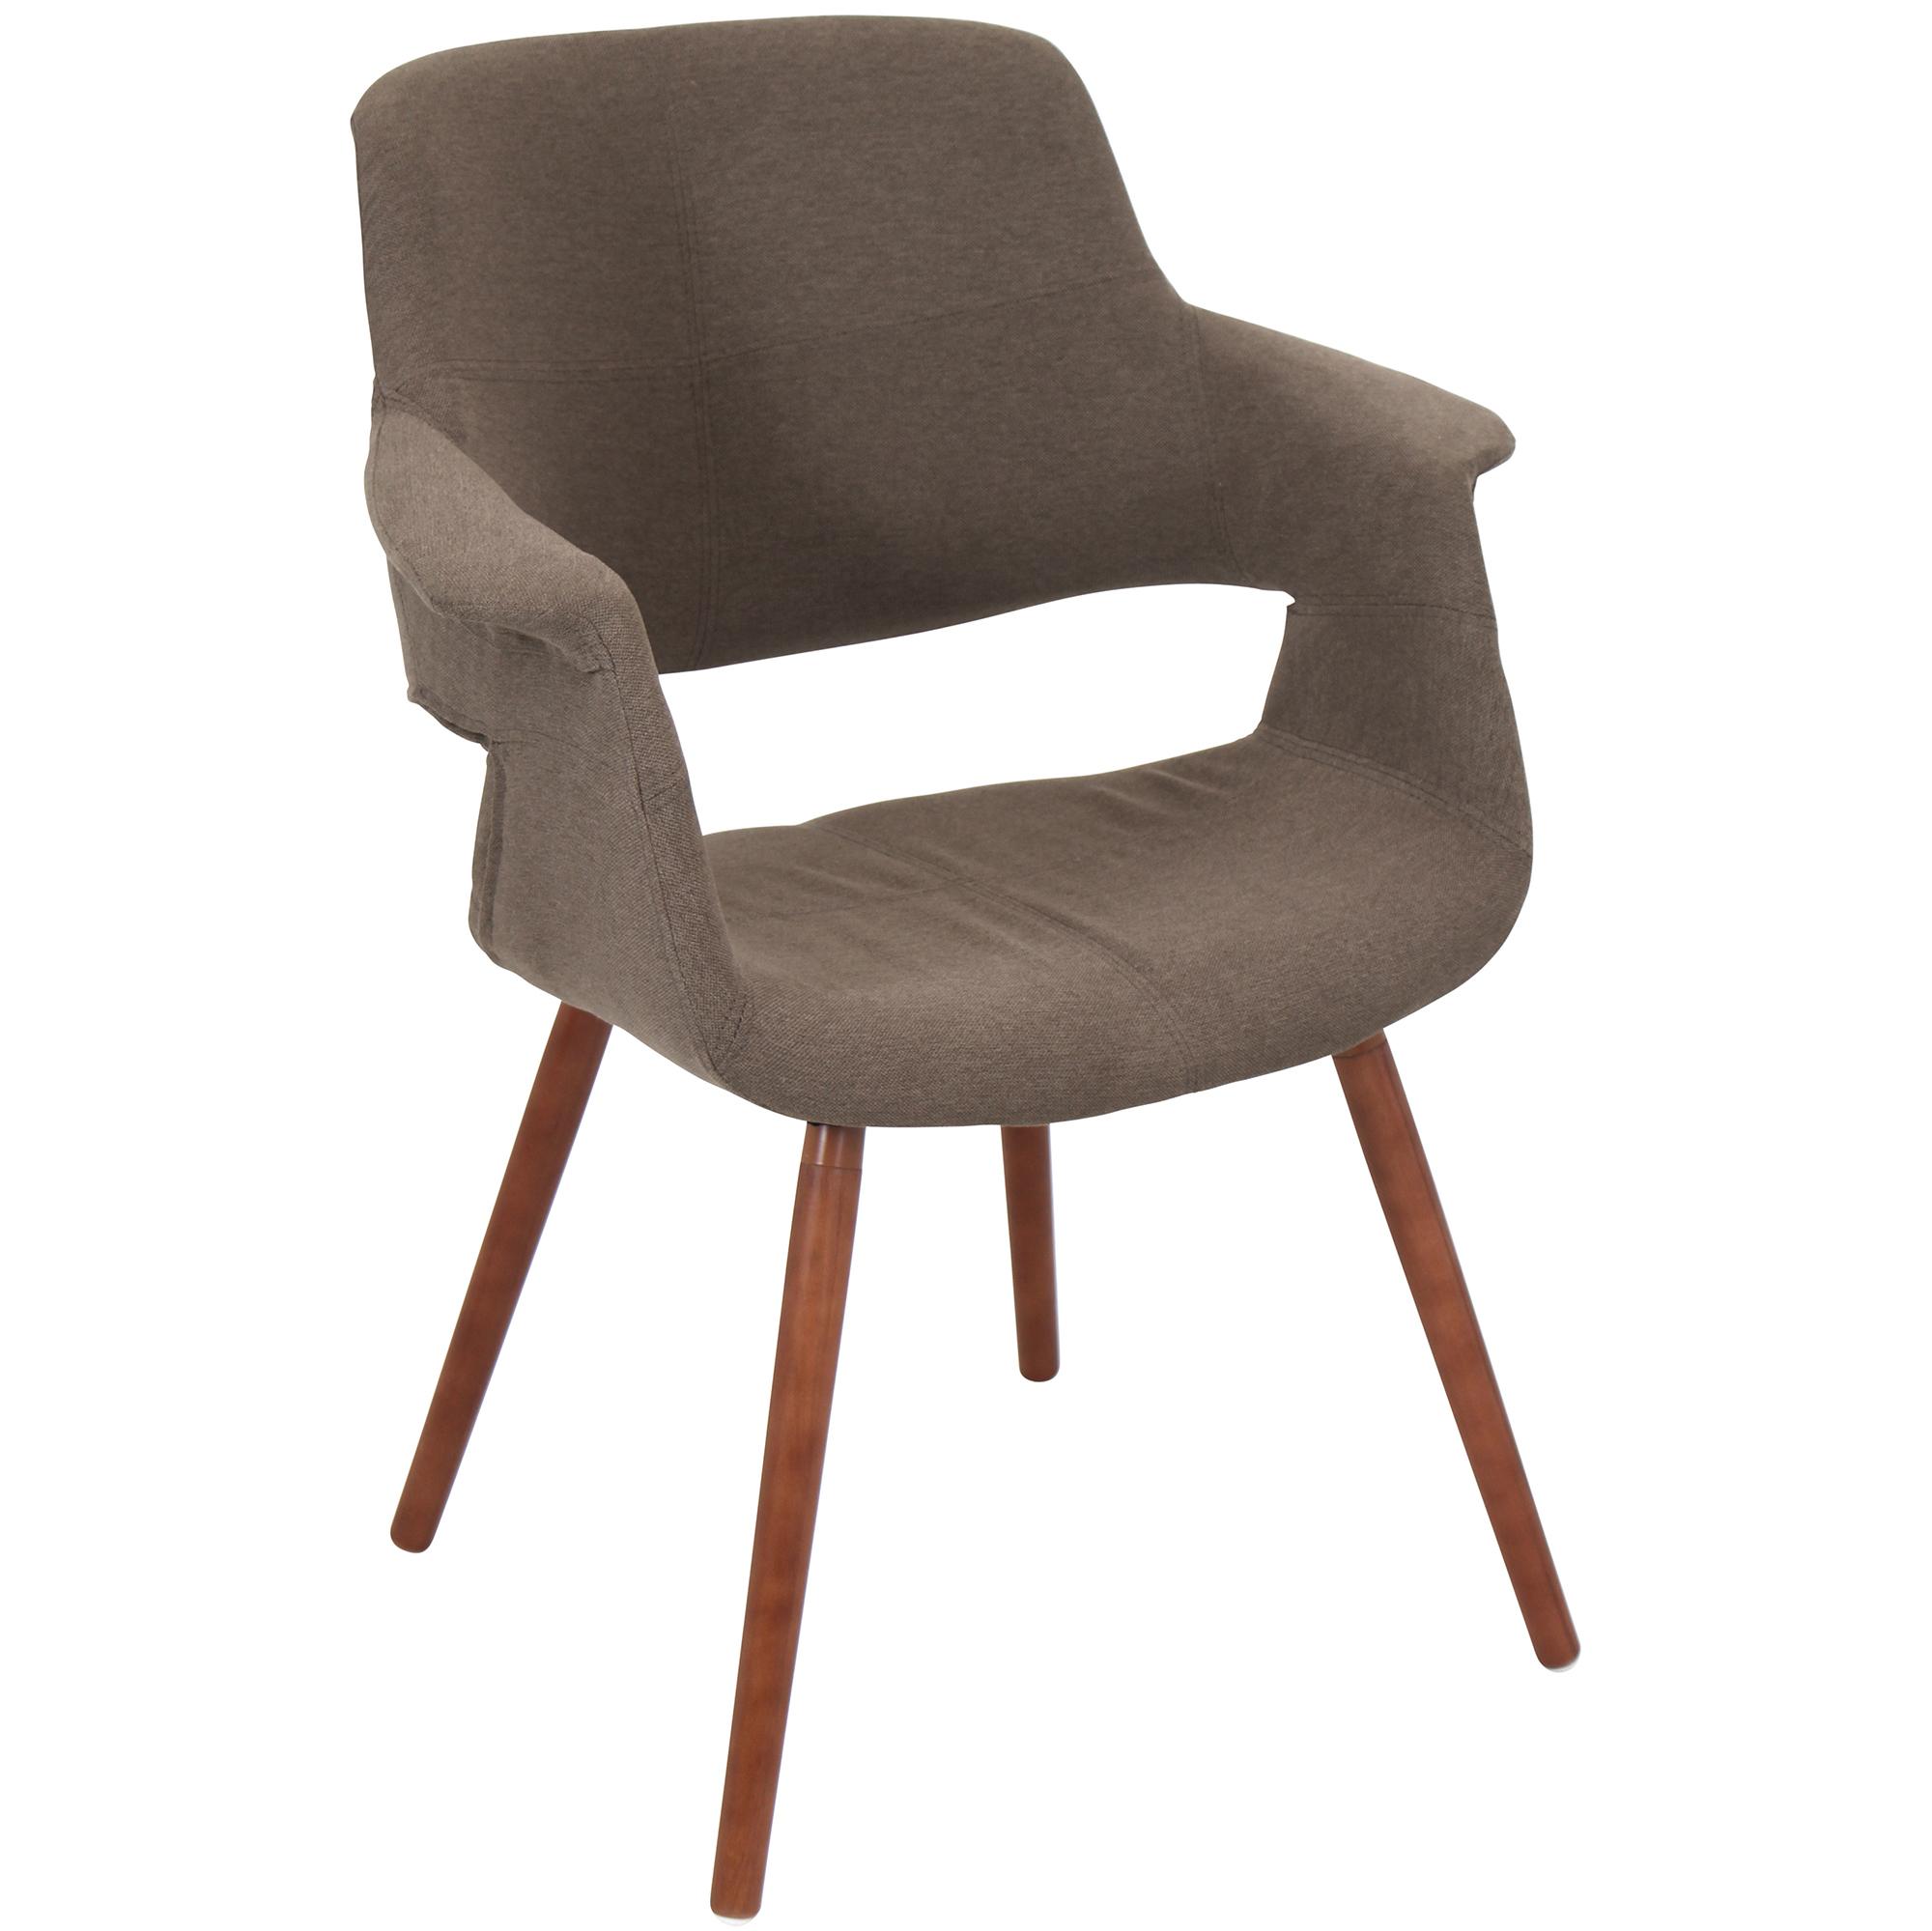 Vintage Flair Mid-Century Modern Chair in Medium Brown by LumiSource